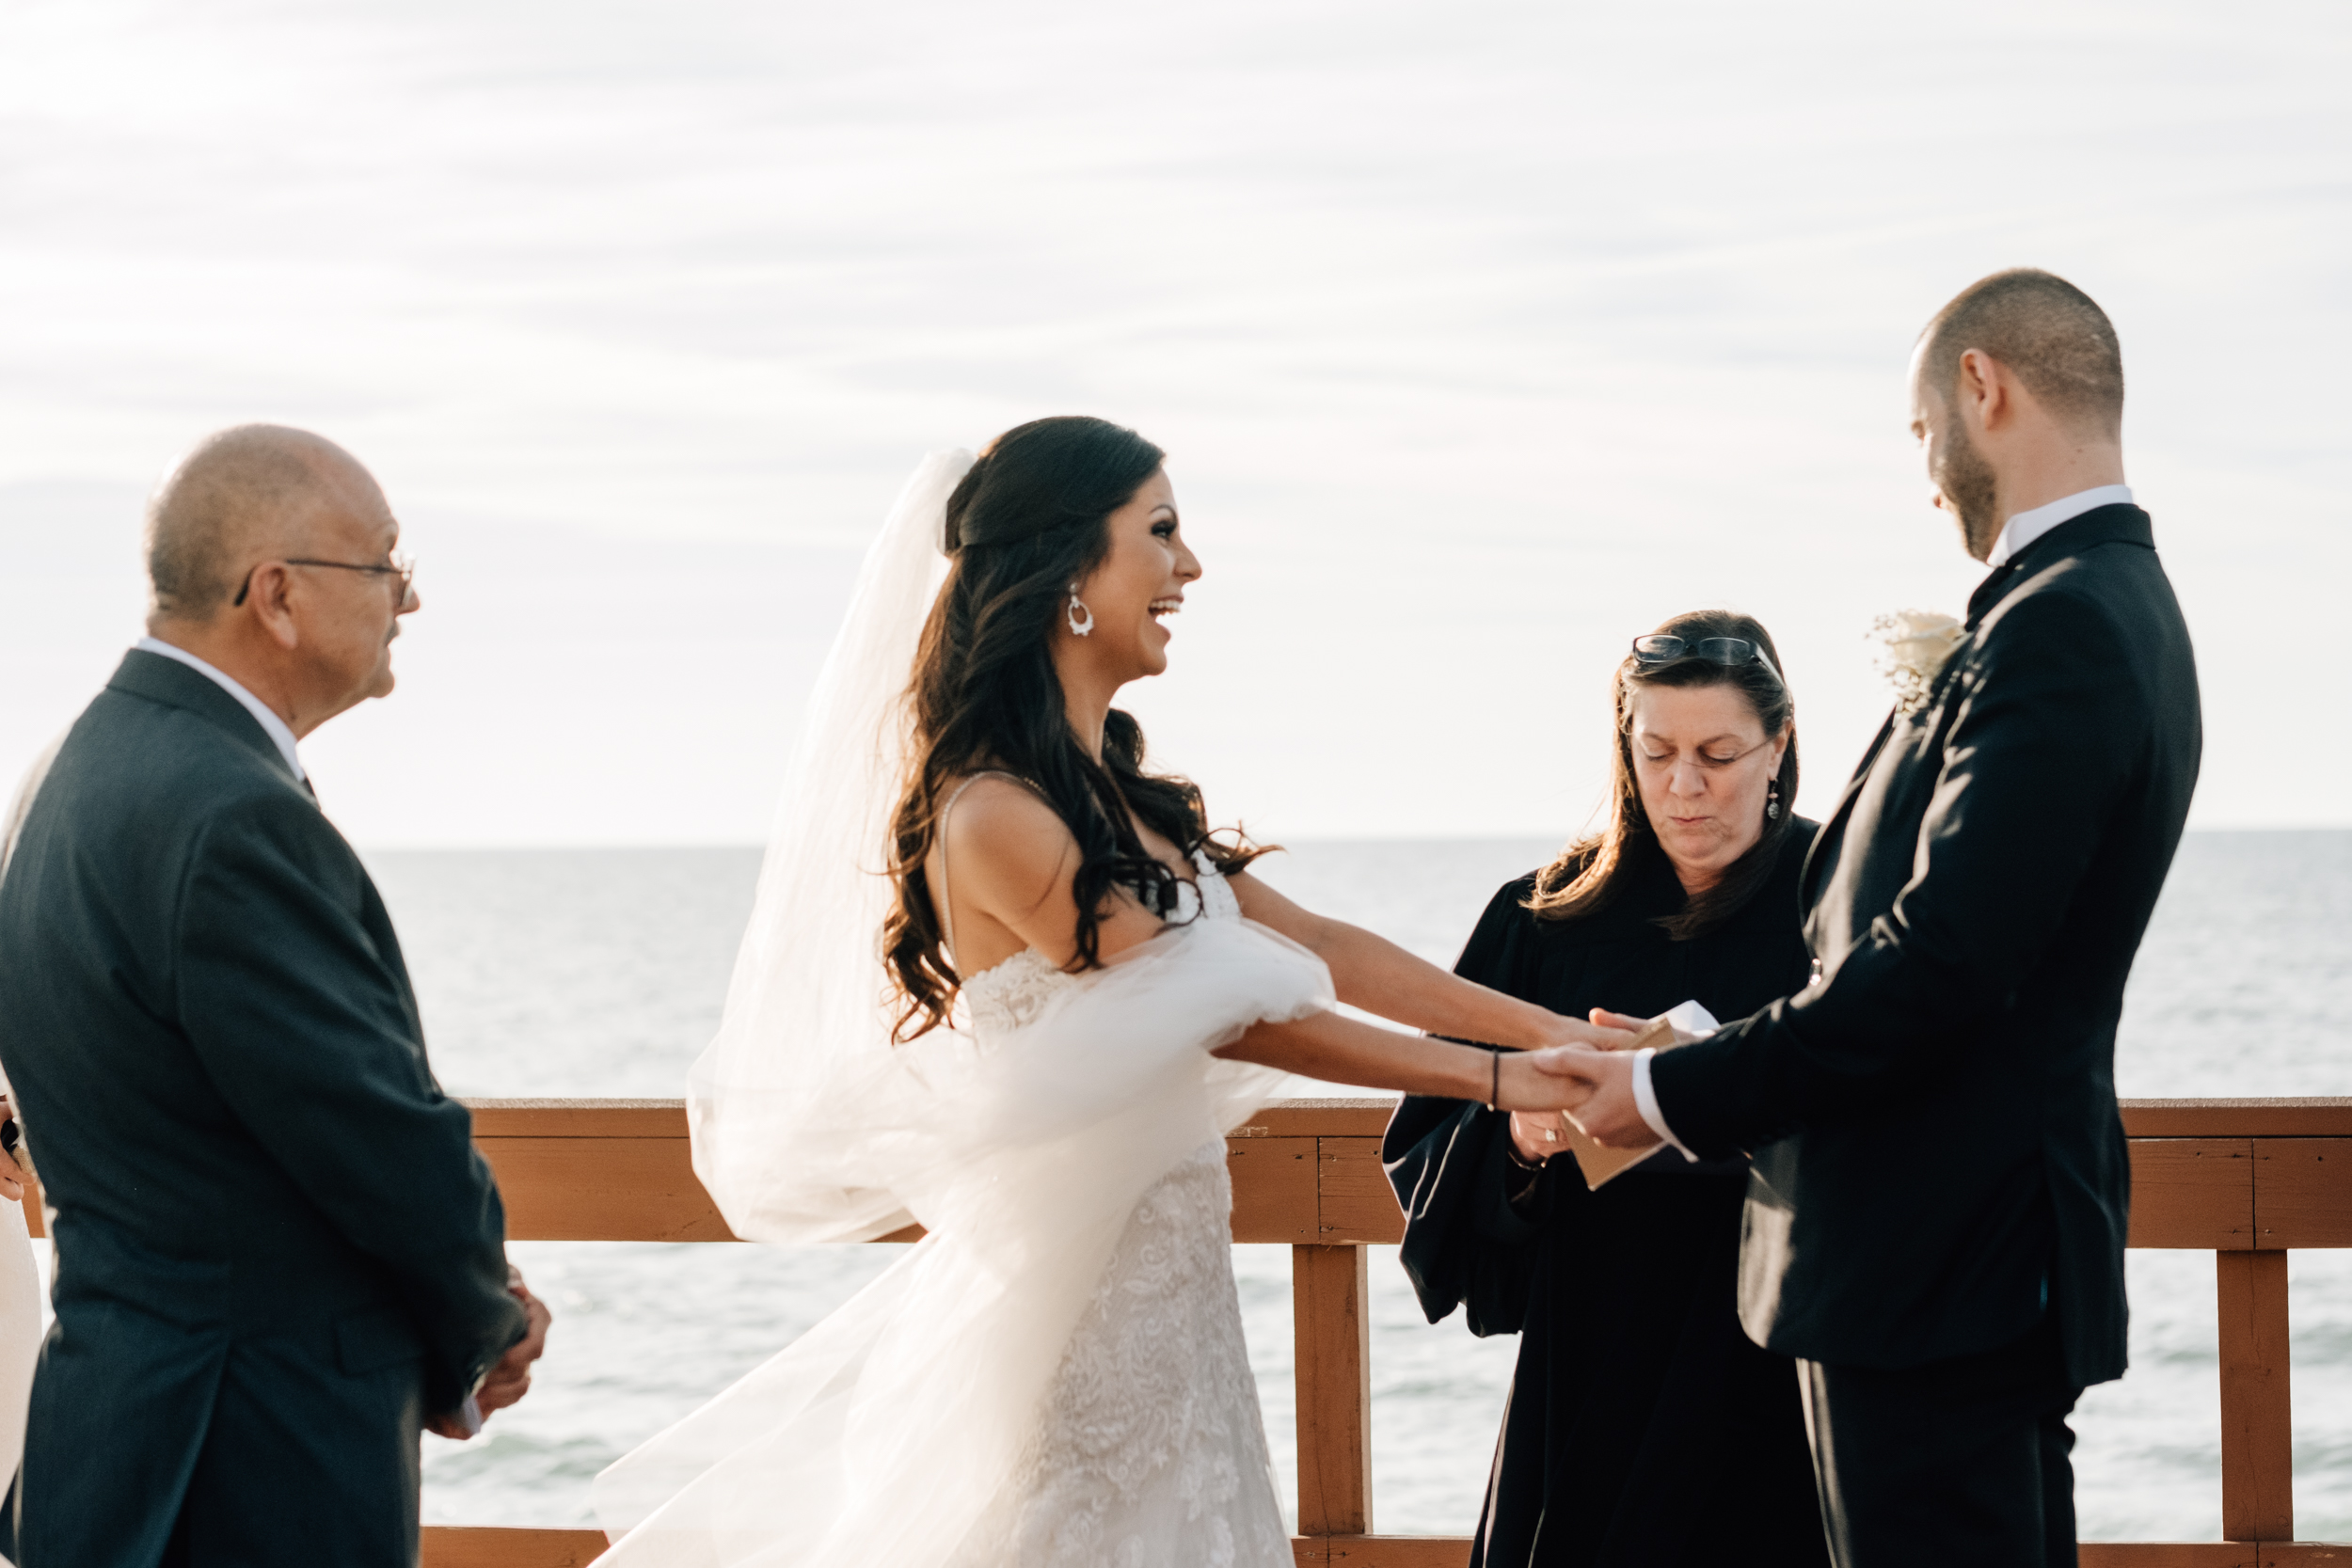 Amethyst Weddings - Georgi and Mariana 043.jpg